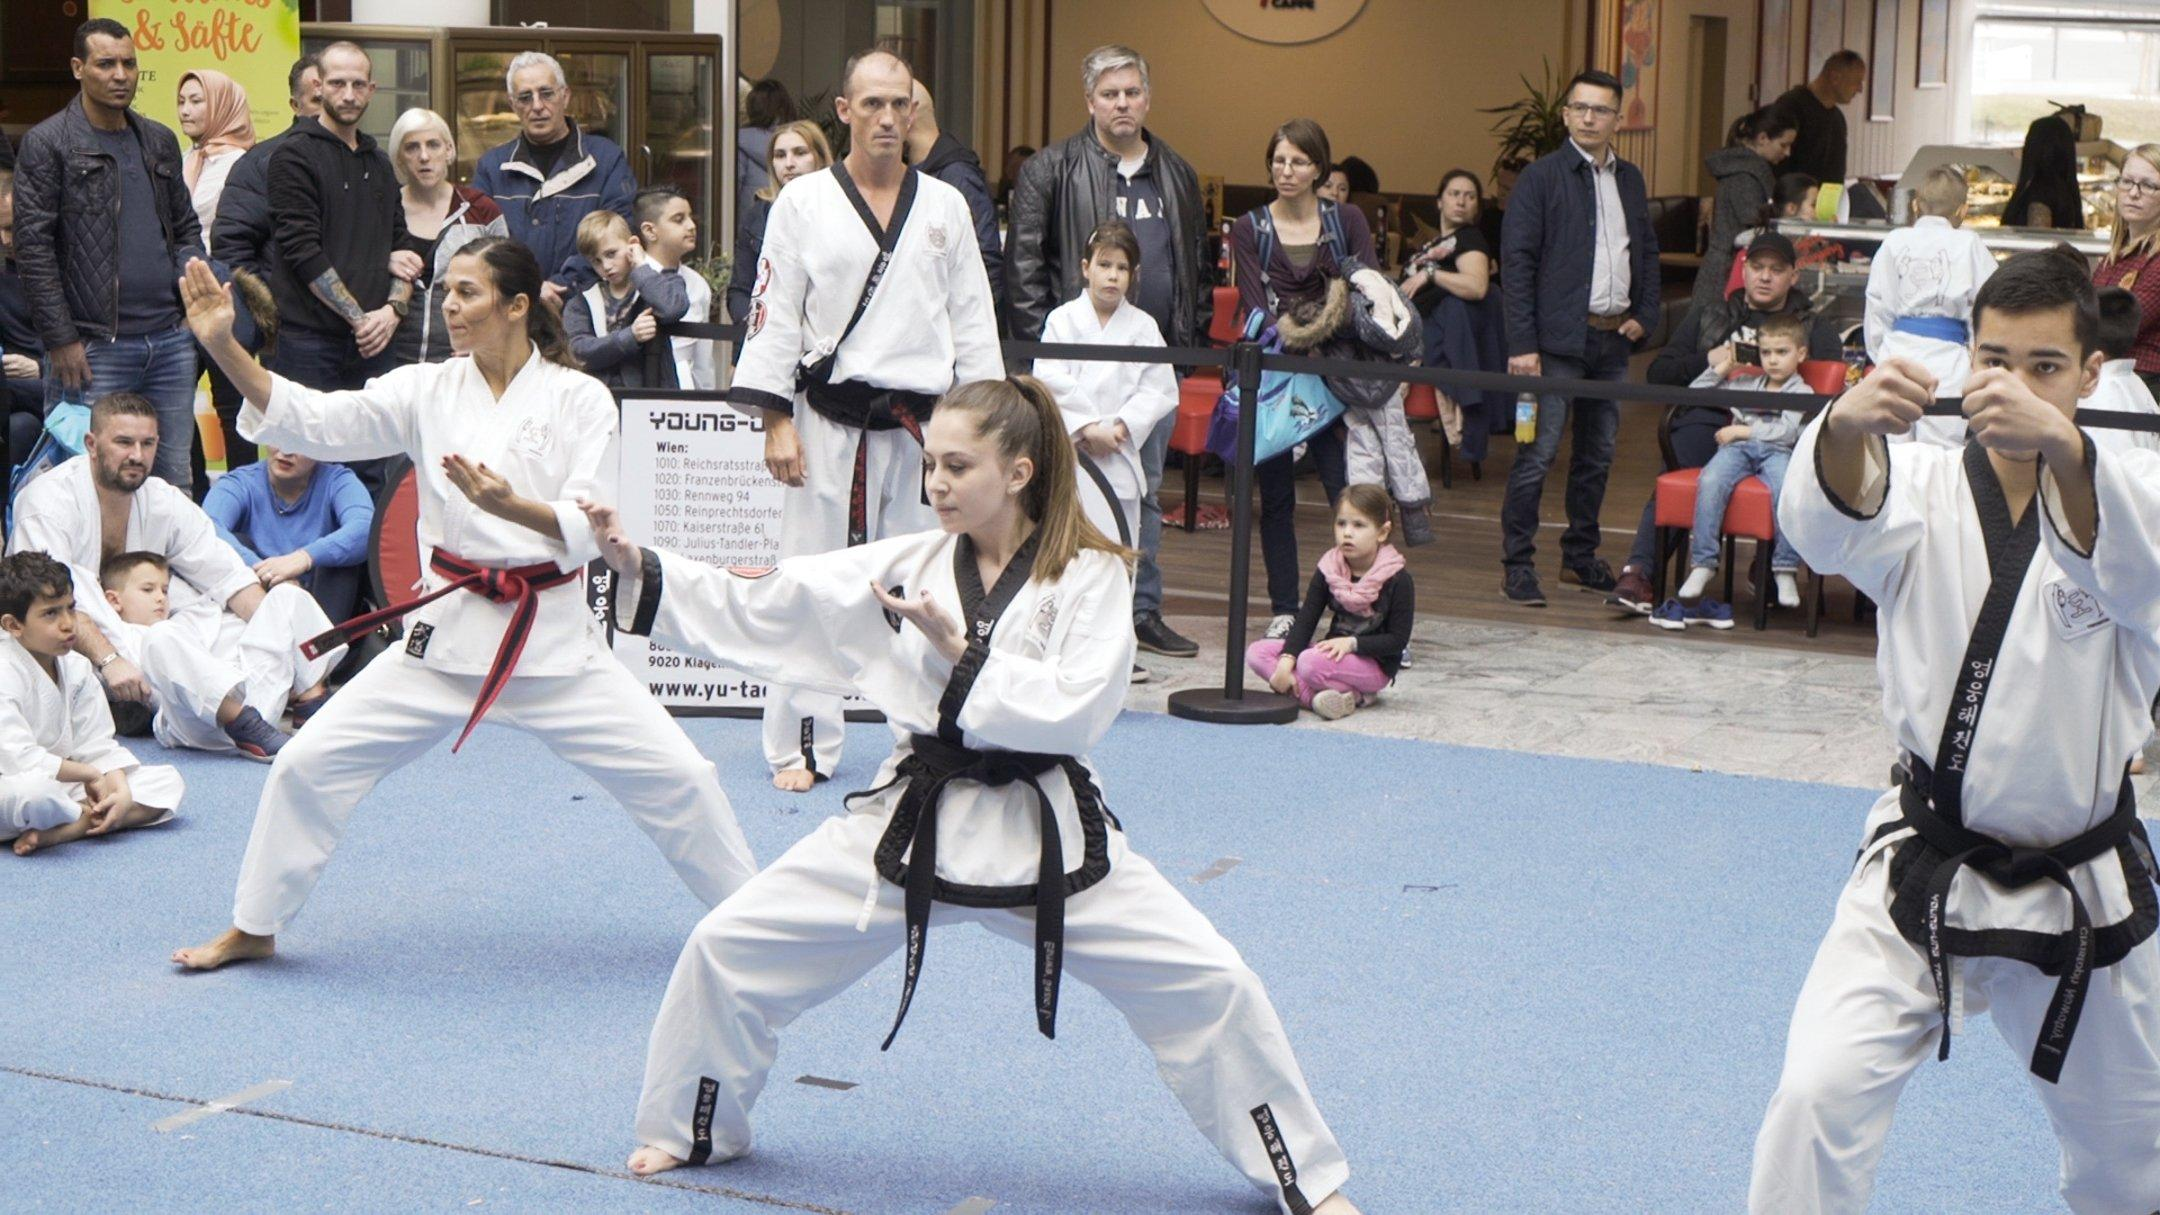 YOUNG-UNG Taekwondo Kampfsport SCN Turnier